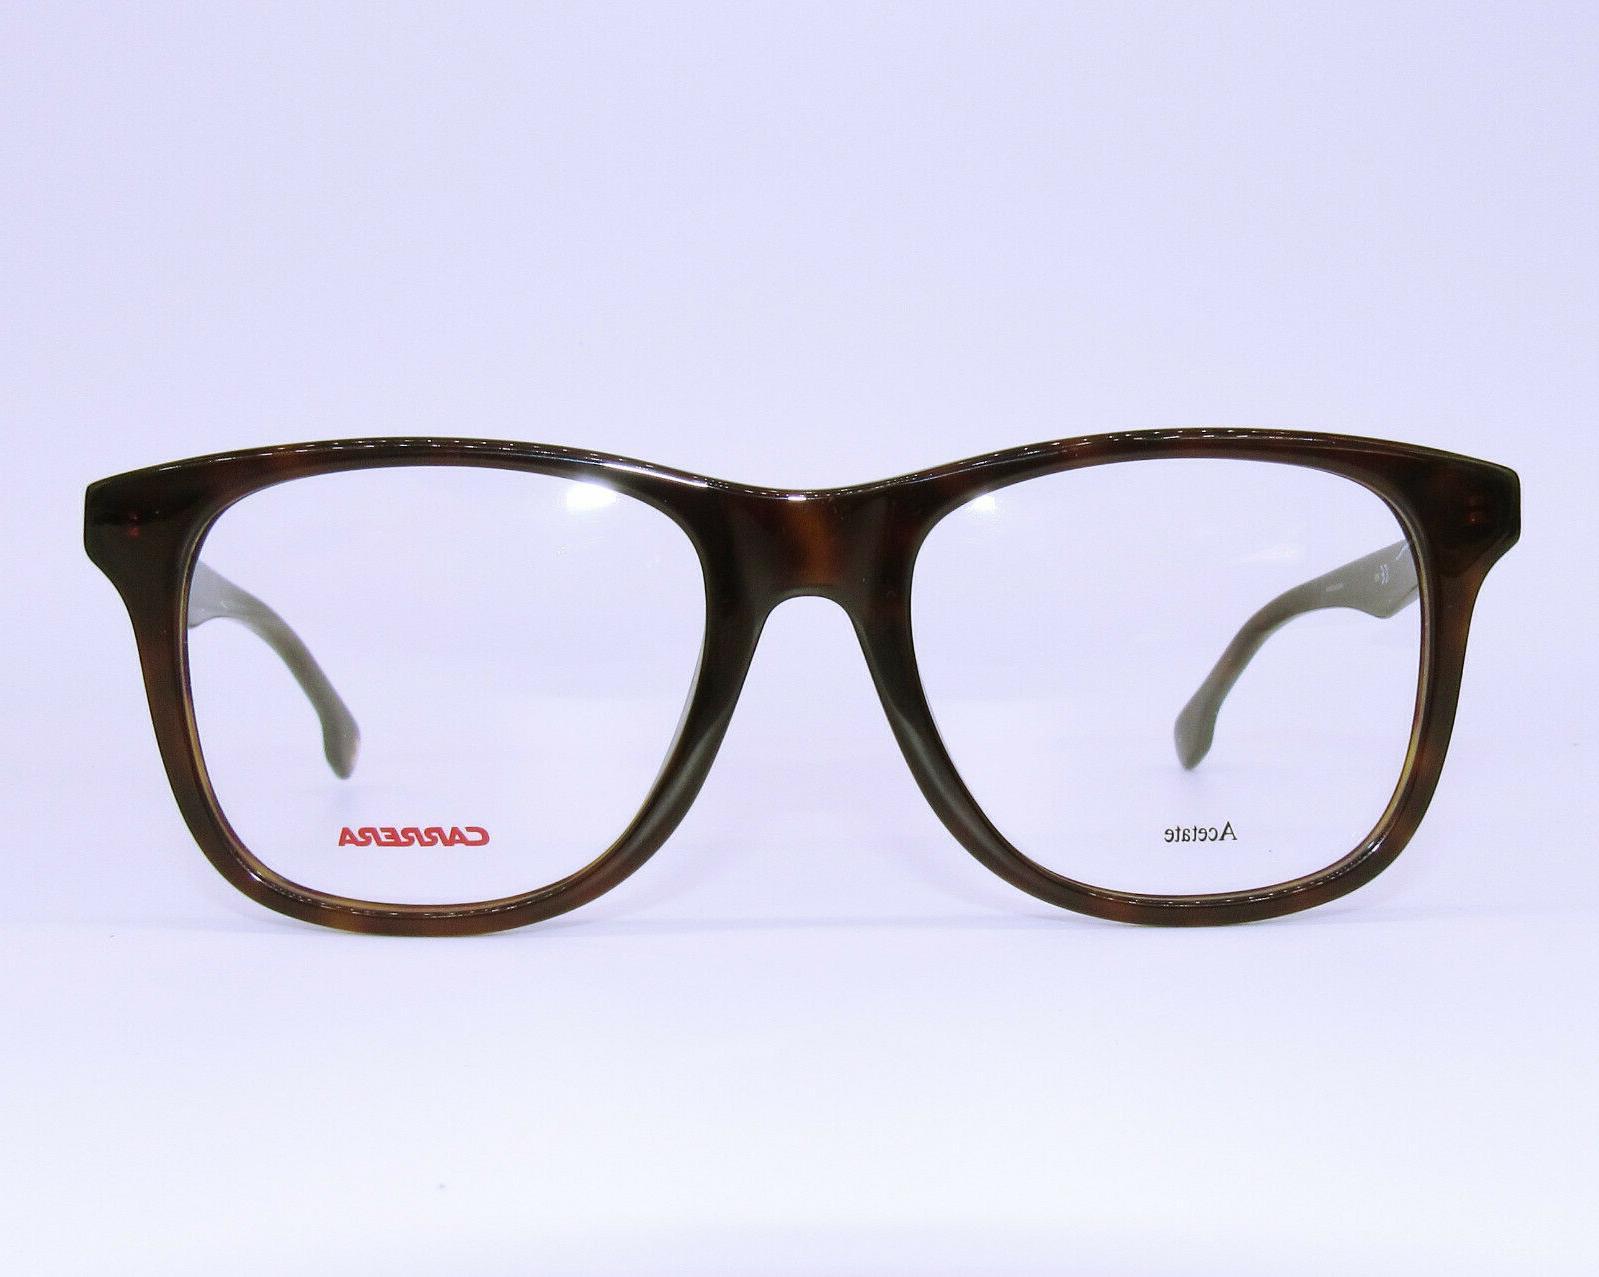 Carrera Havana / Eyeglasses